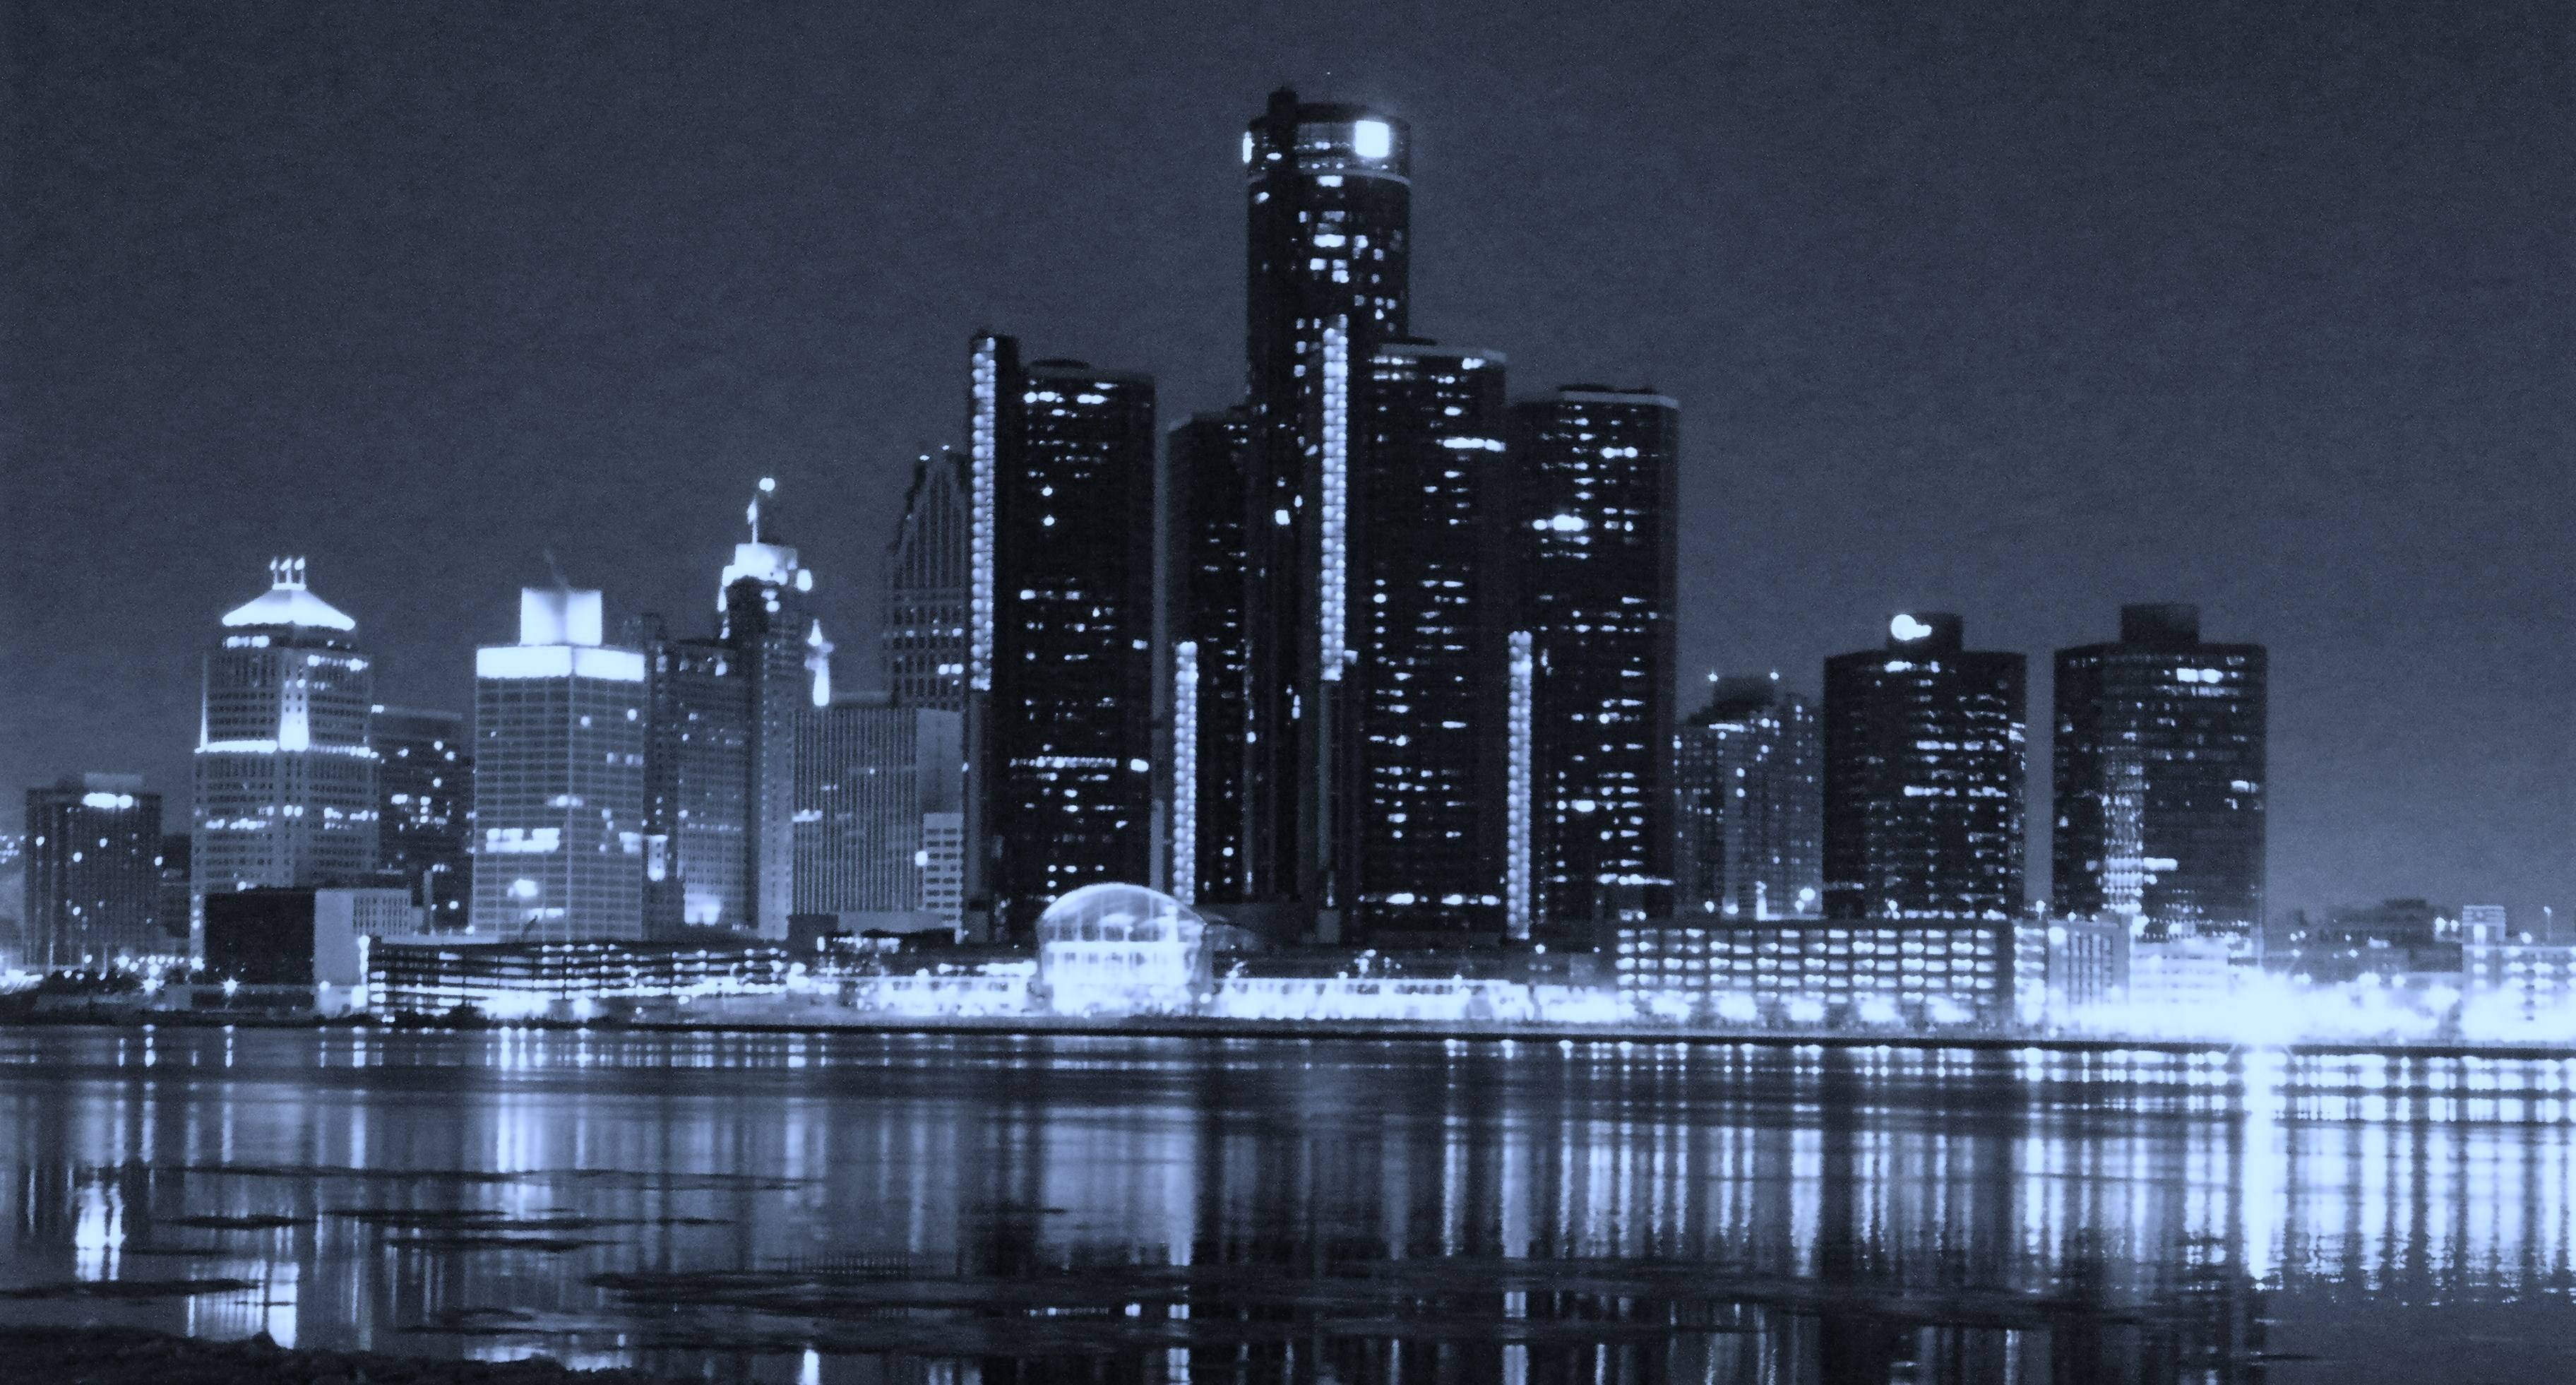 Detroit Skyline Wallpapers - Wallpaper Cave